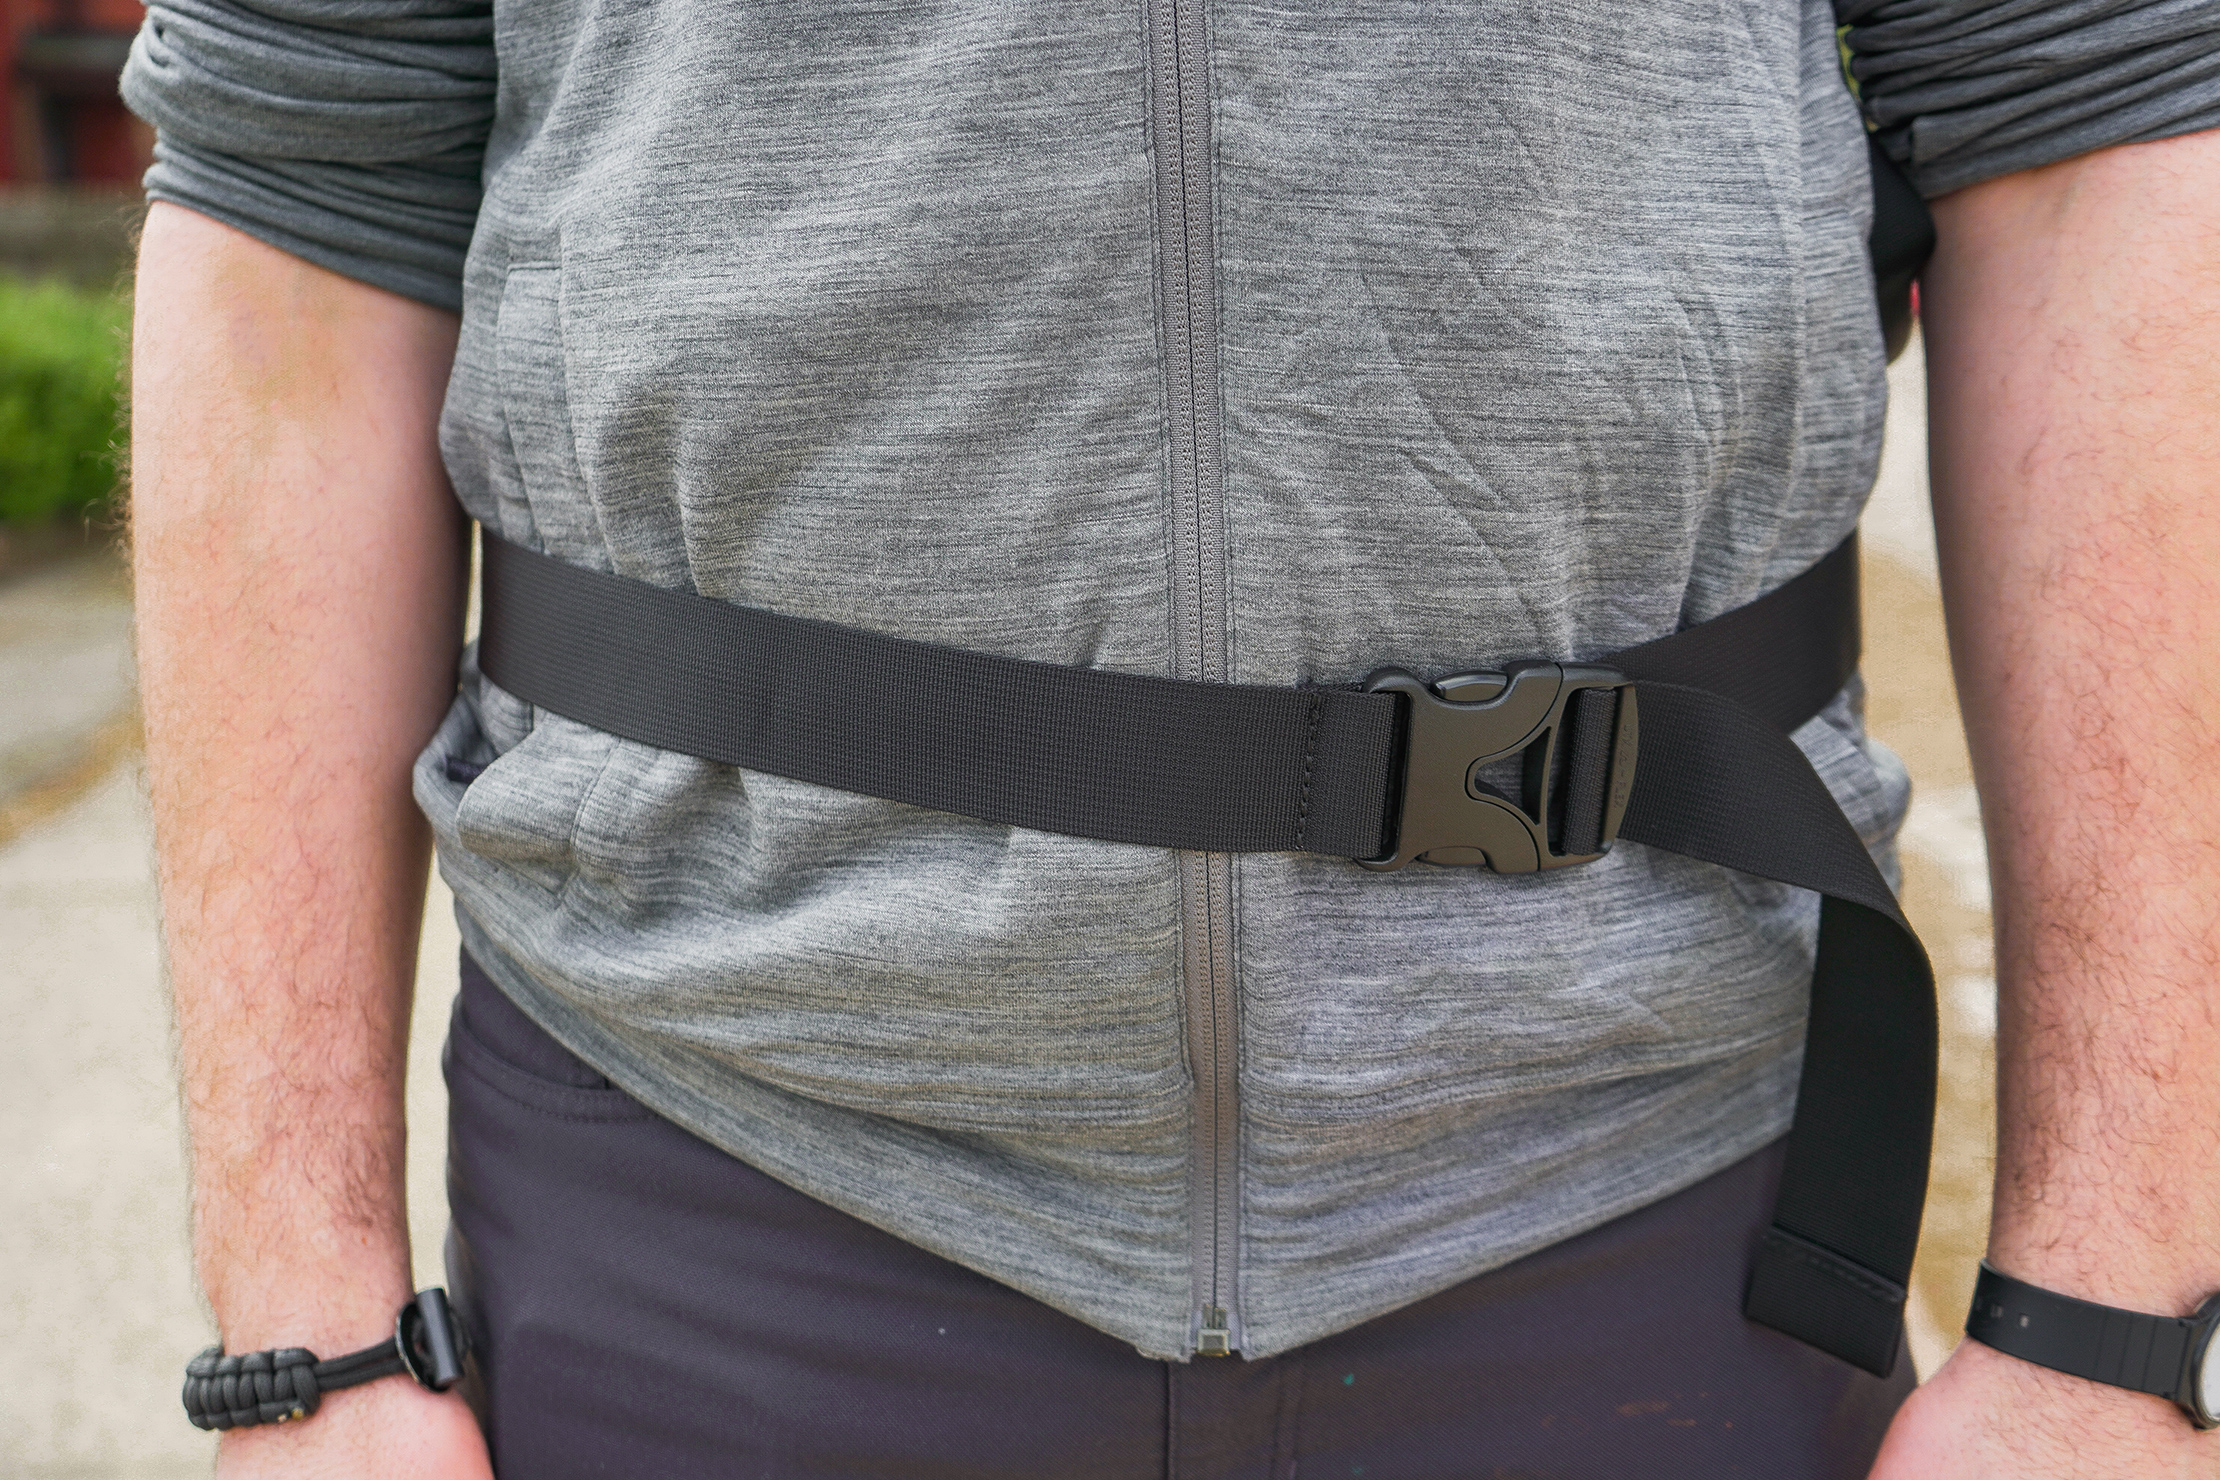 Knack Large Expandable Pack Hip Belt